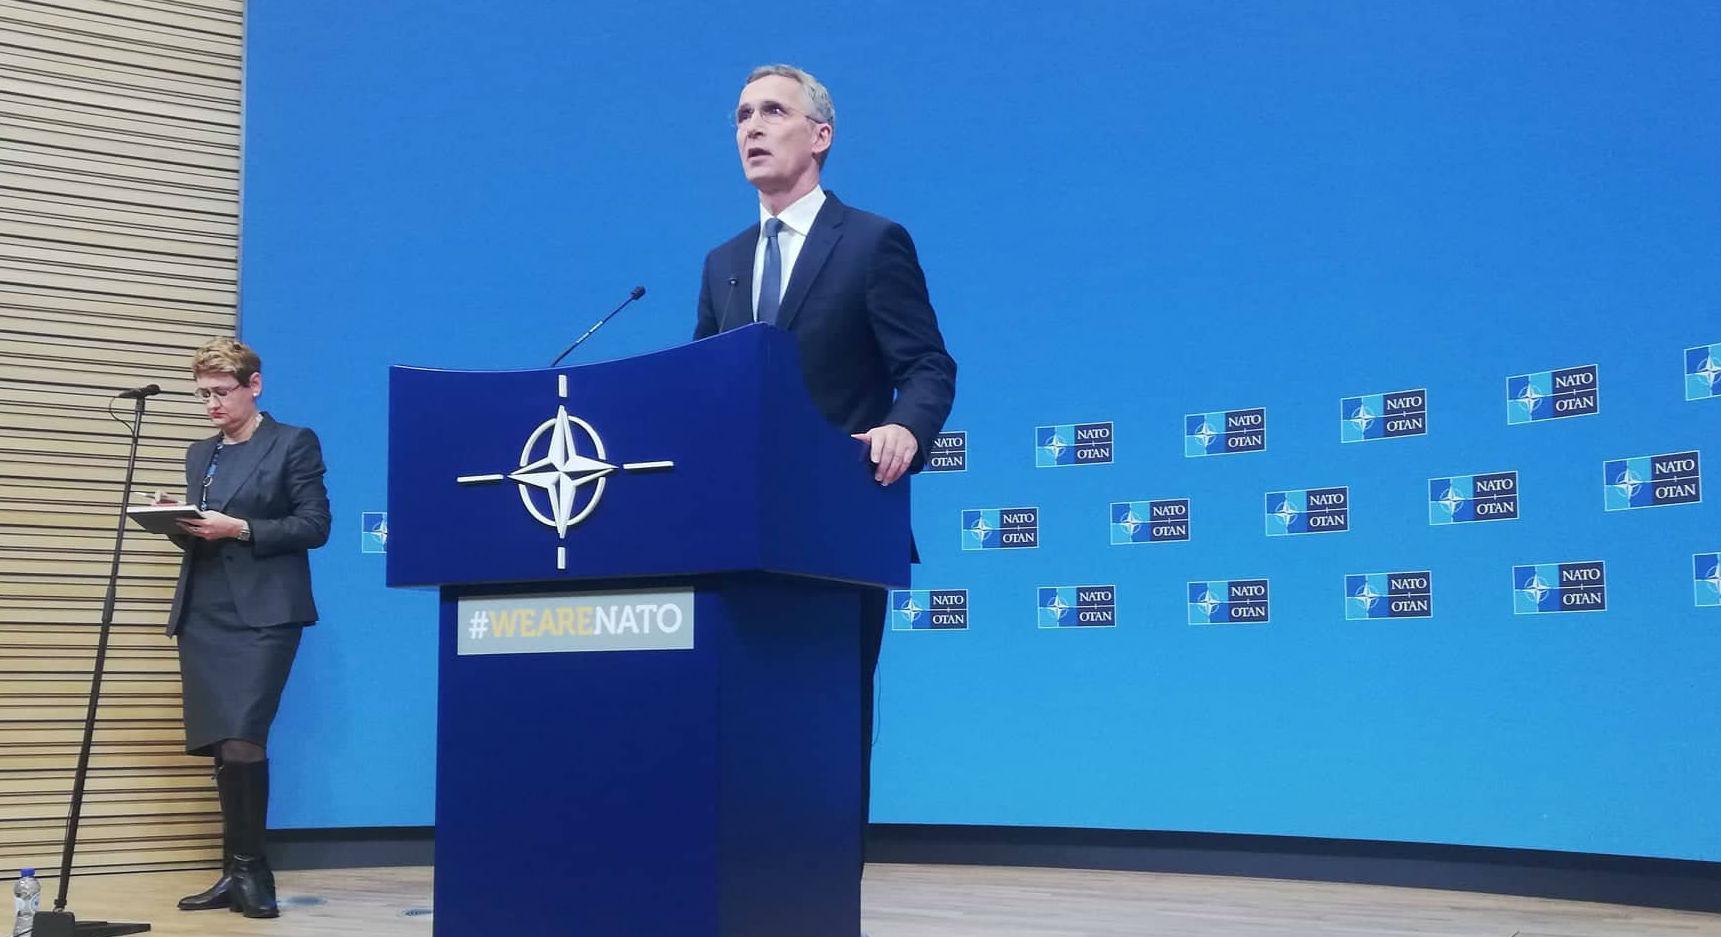 Stoltenberg: Το ΝΑΤΟ είναι απογοητευμένο με τη δασμολόγηση που εισήγαγε το Κοσσυφοπέδιο